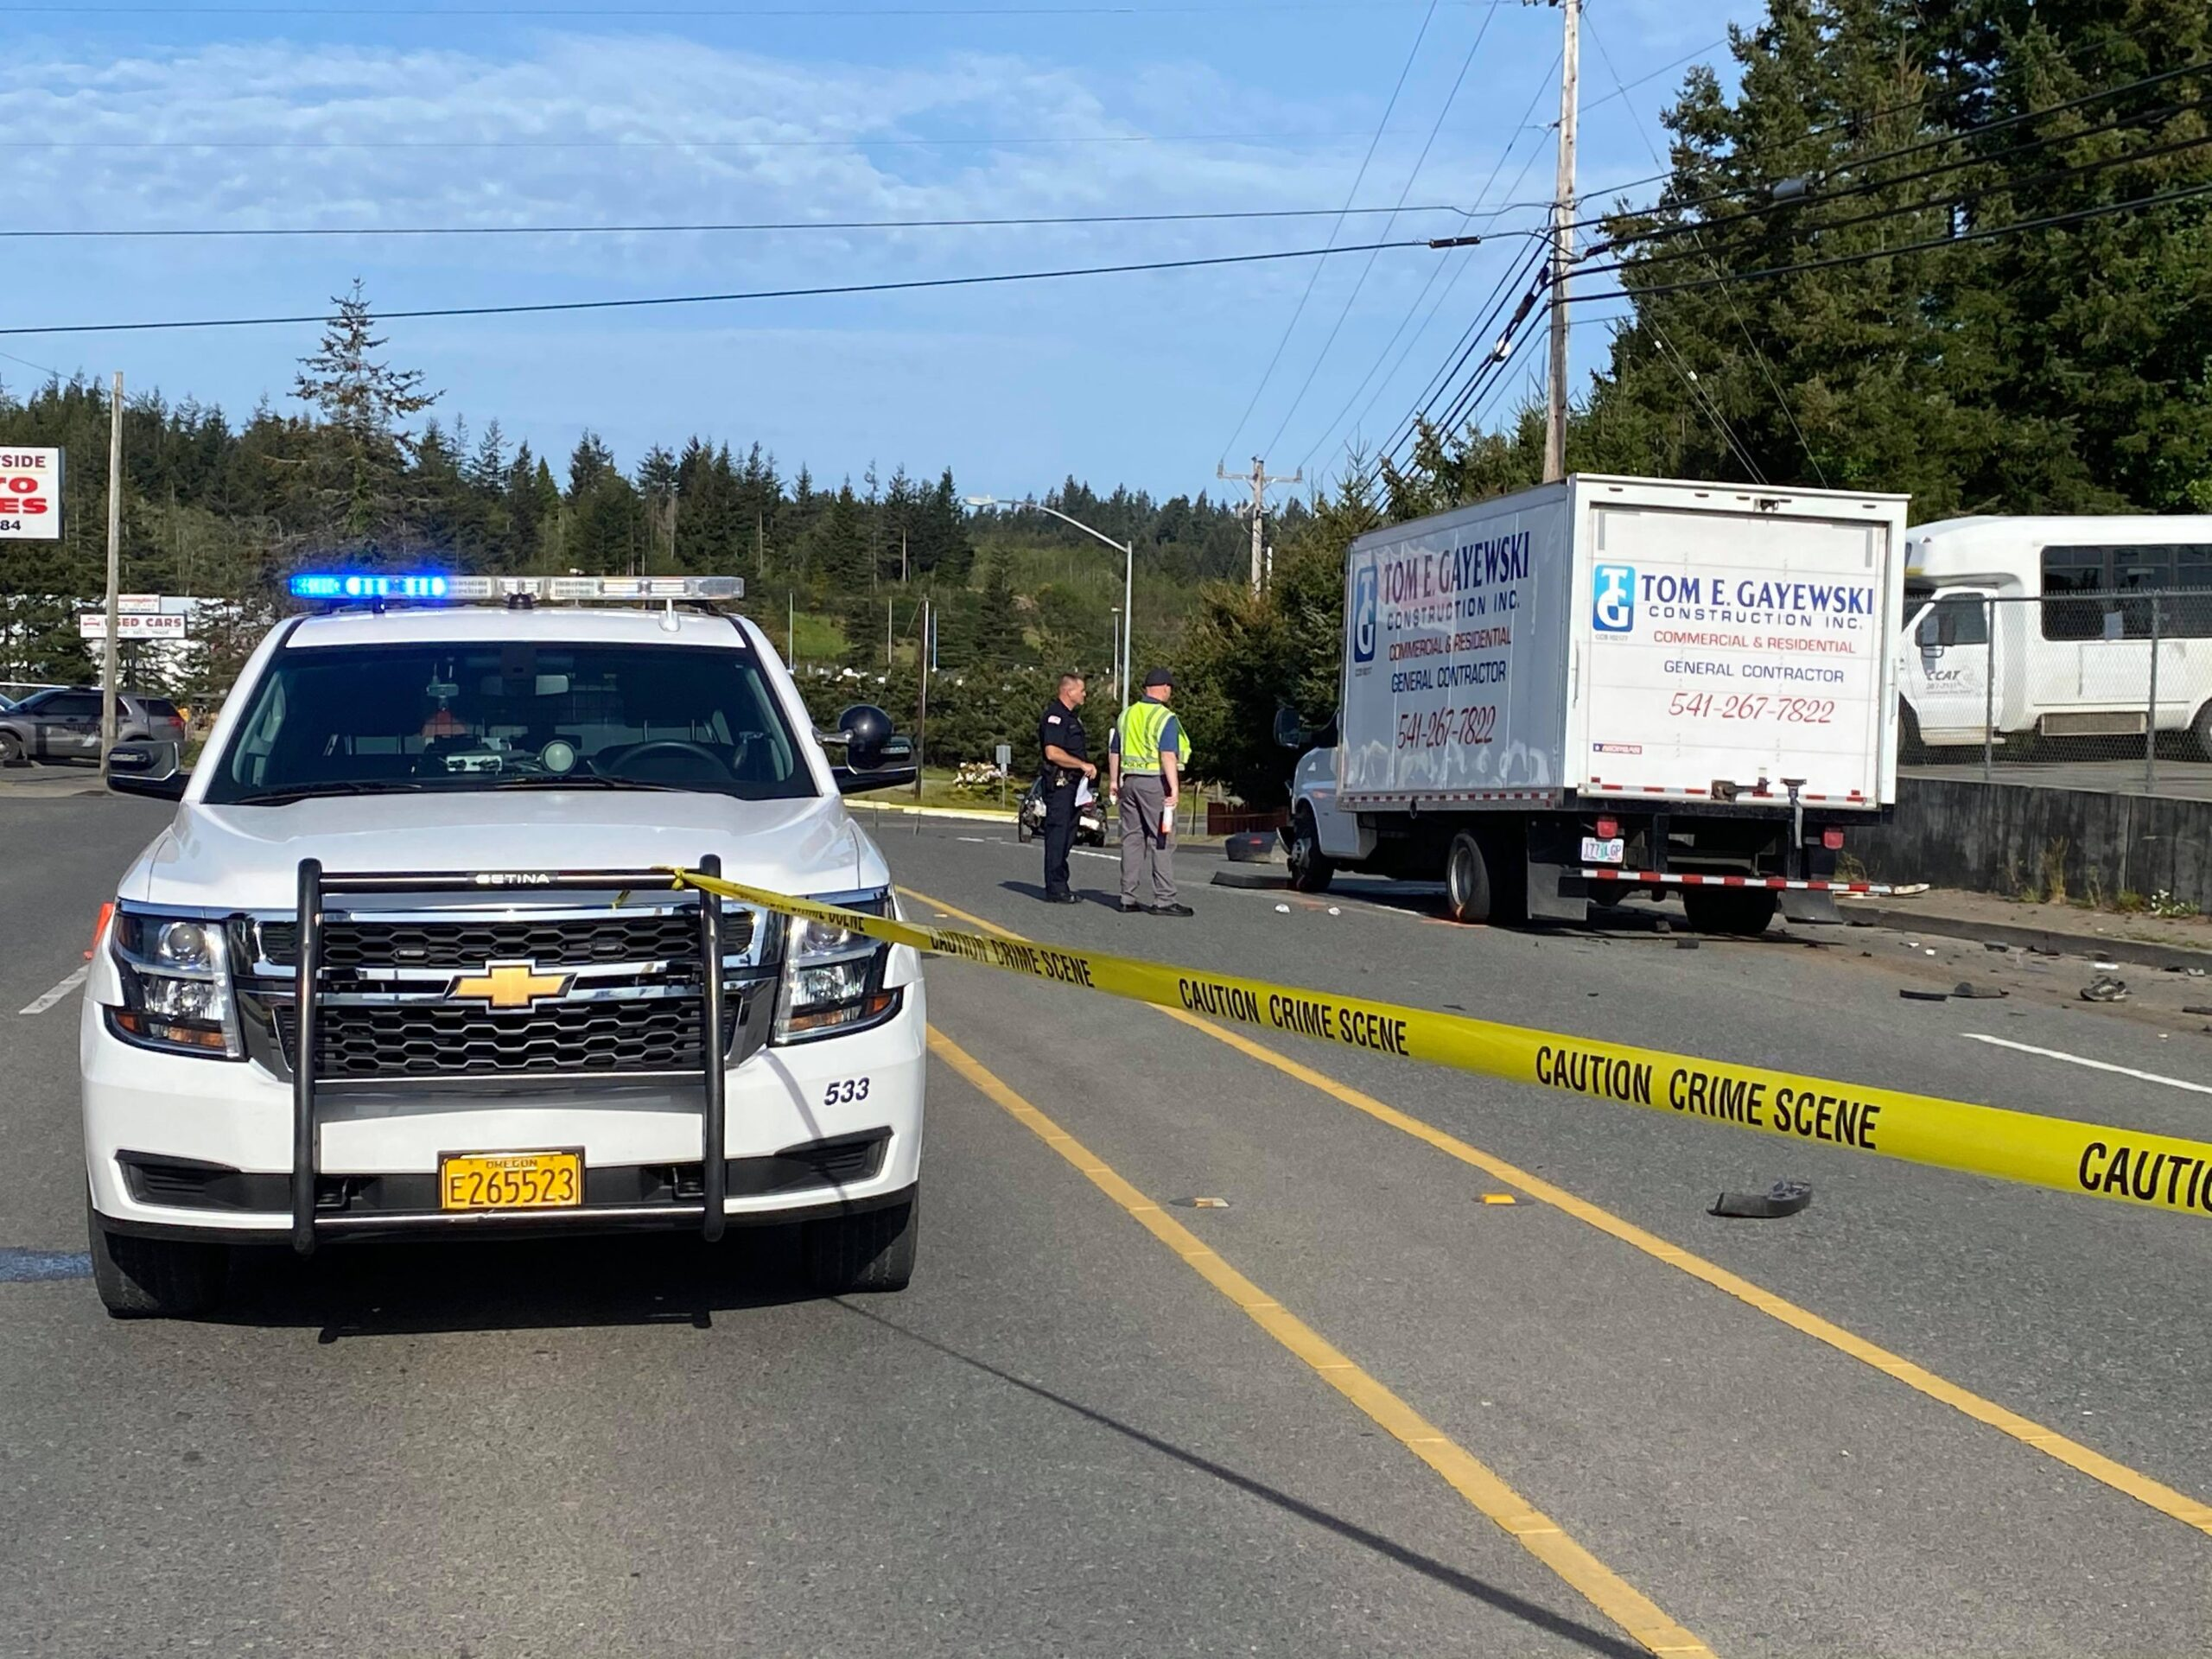 Ocean Boulevard Crash Victim Identified/Citation Issued